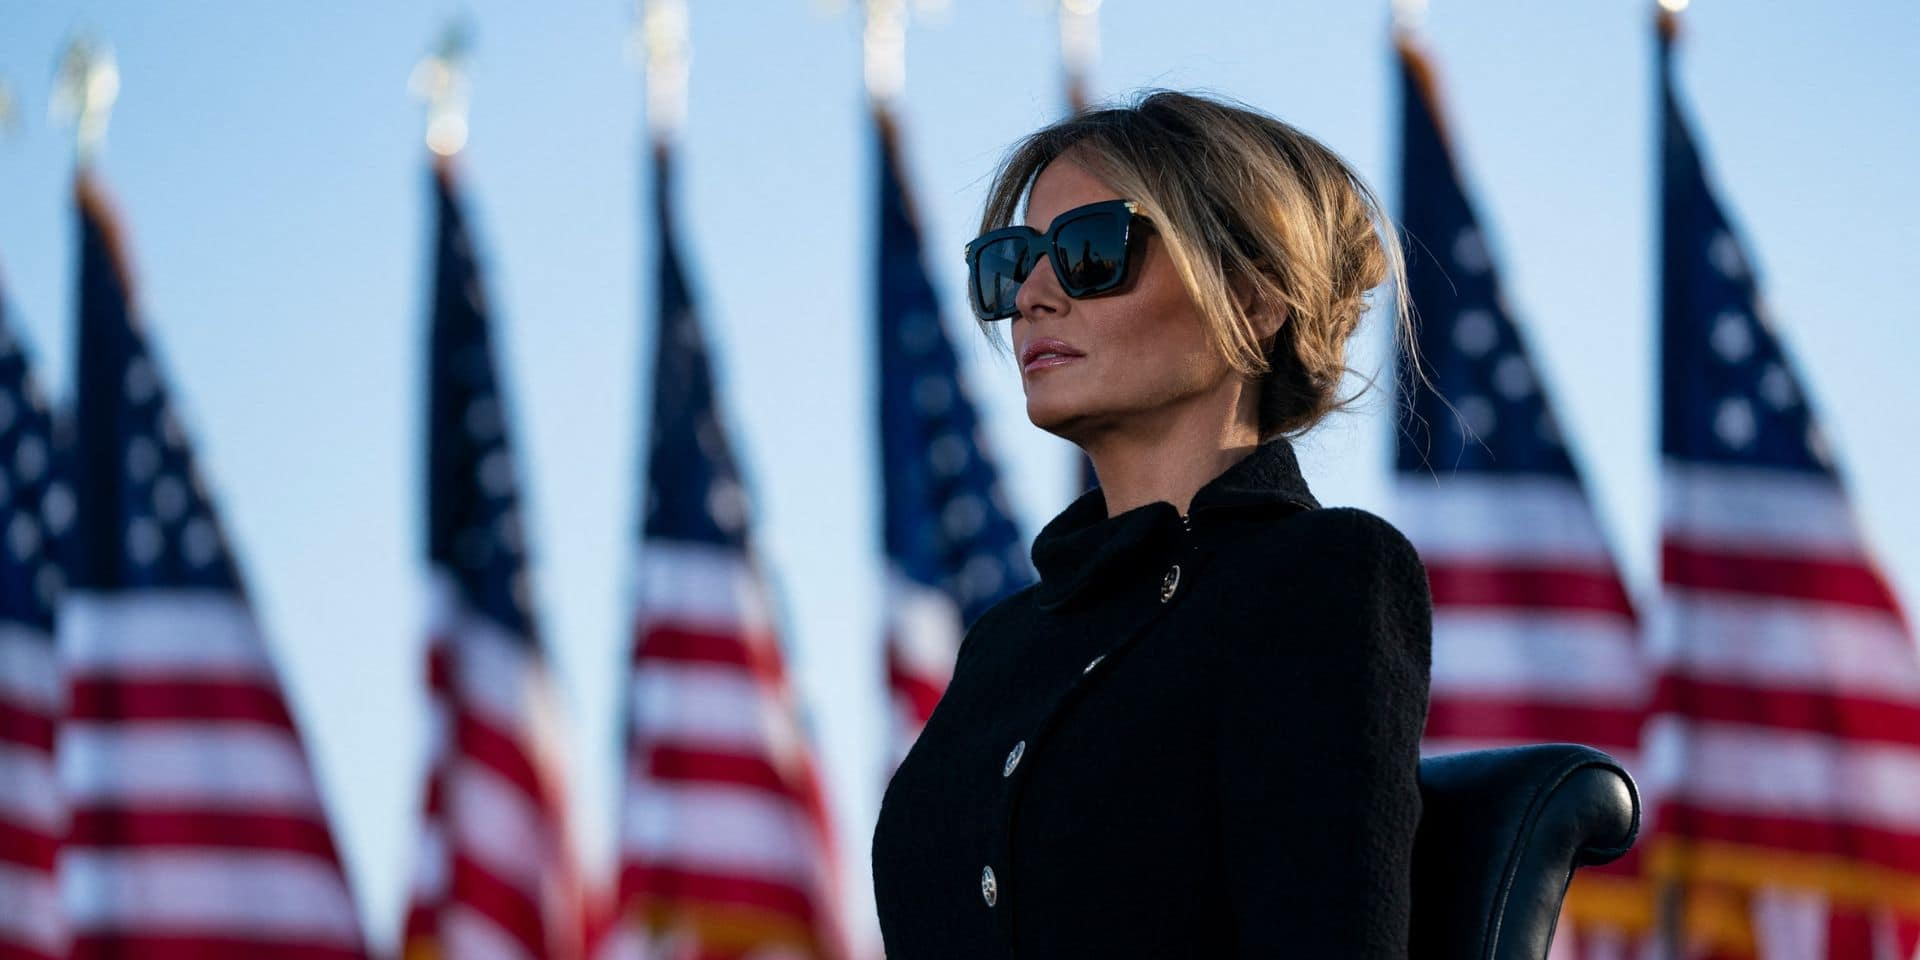 L'étonnante reconversion de Melania Trump